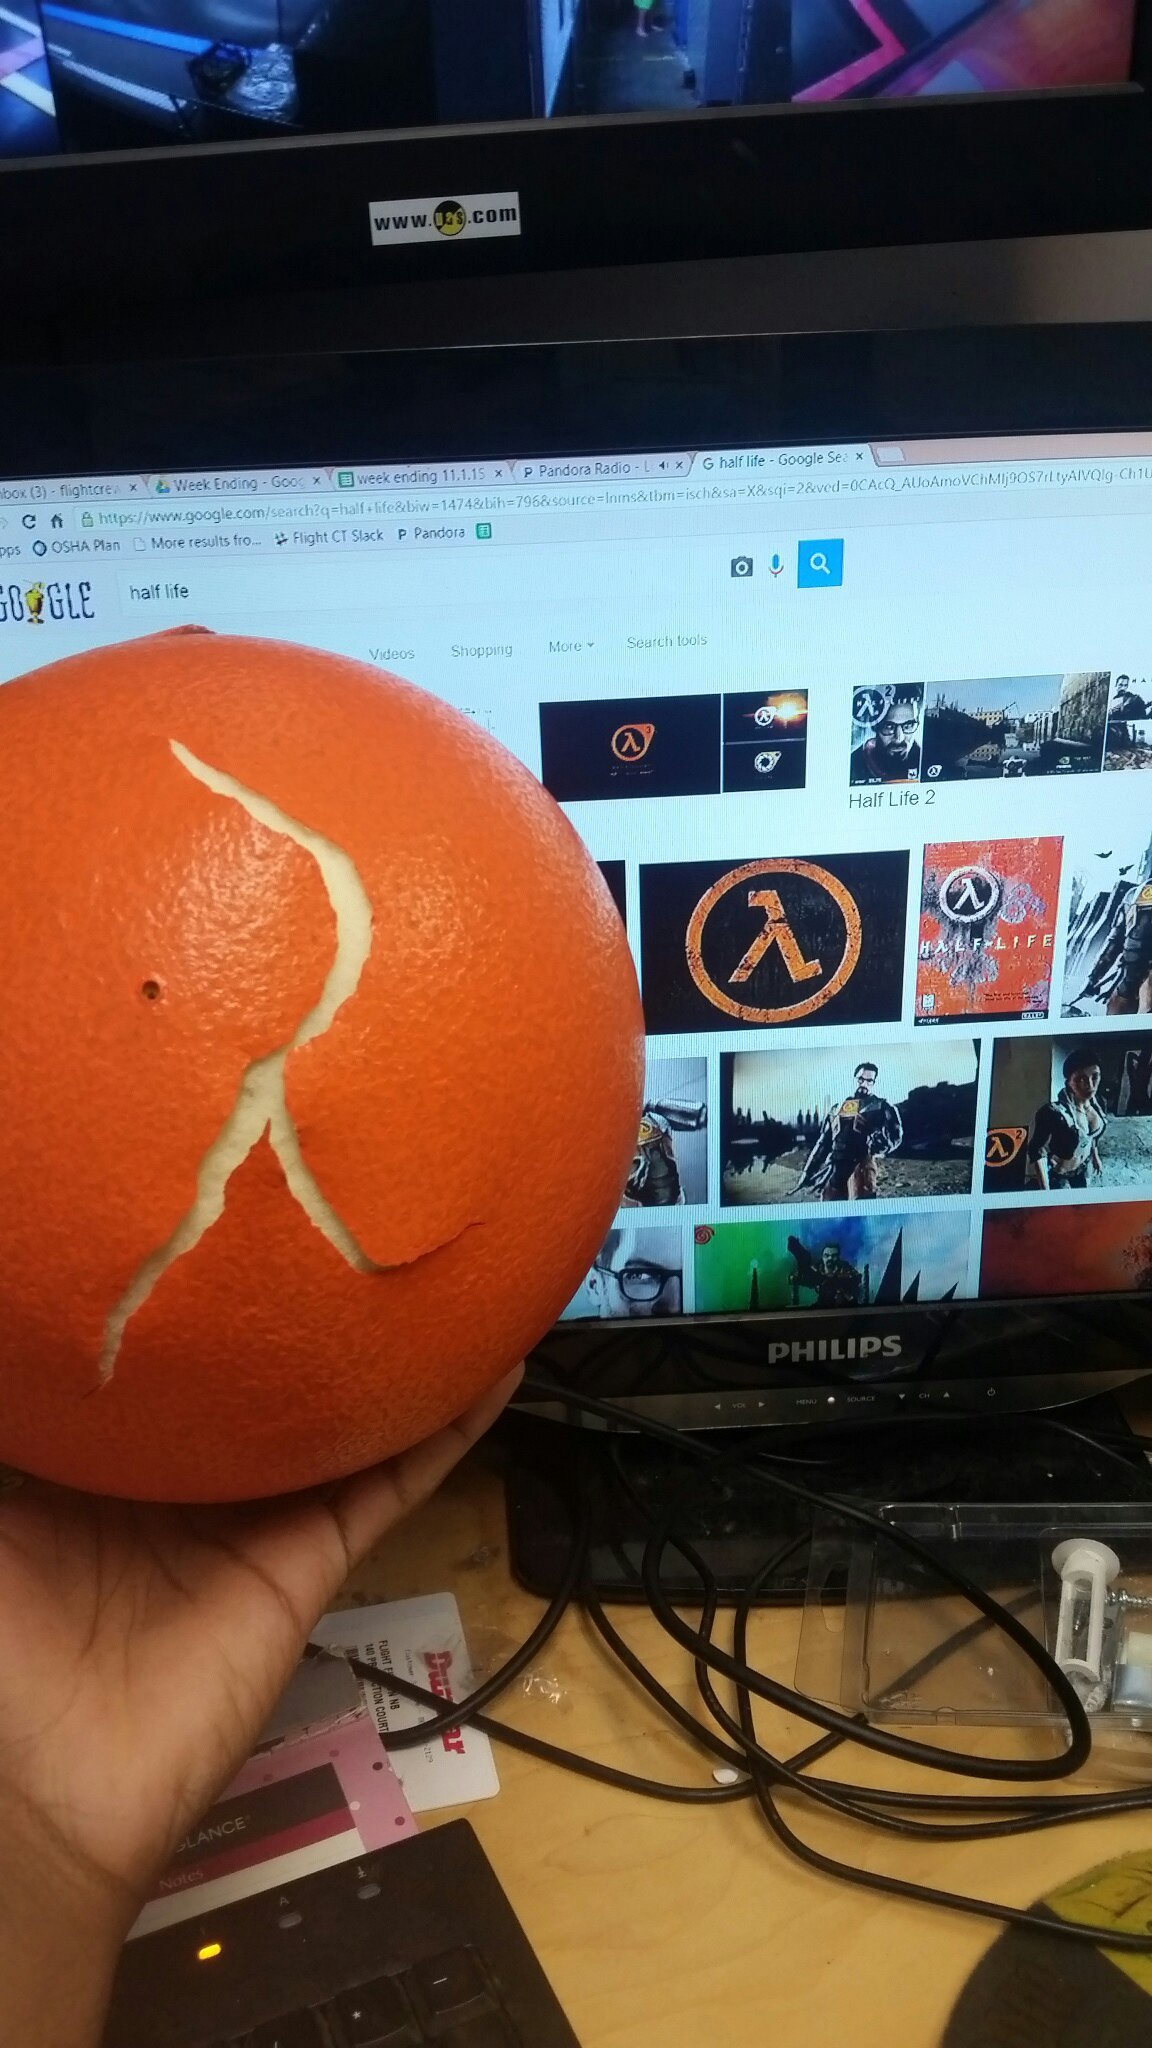 Half-life 3 confirmed? - meme